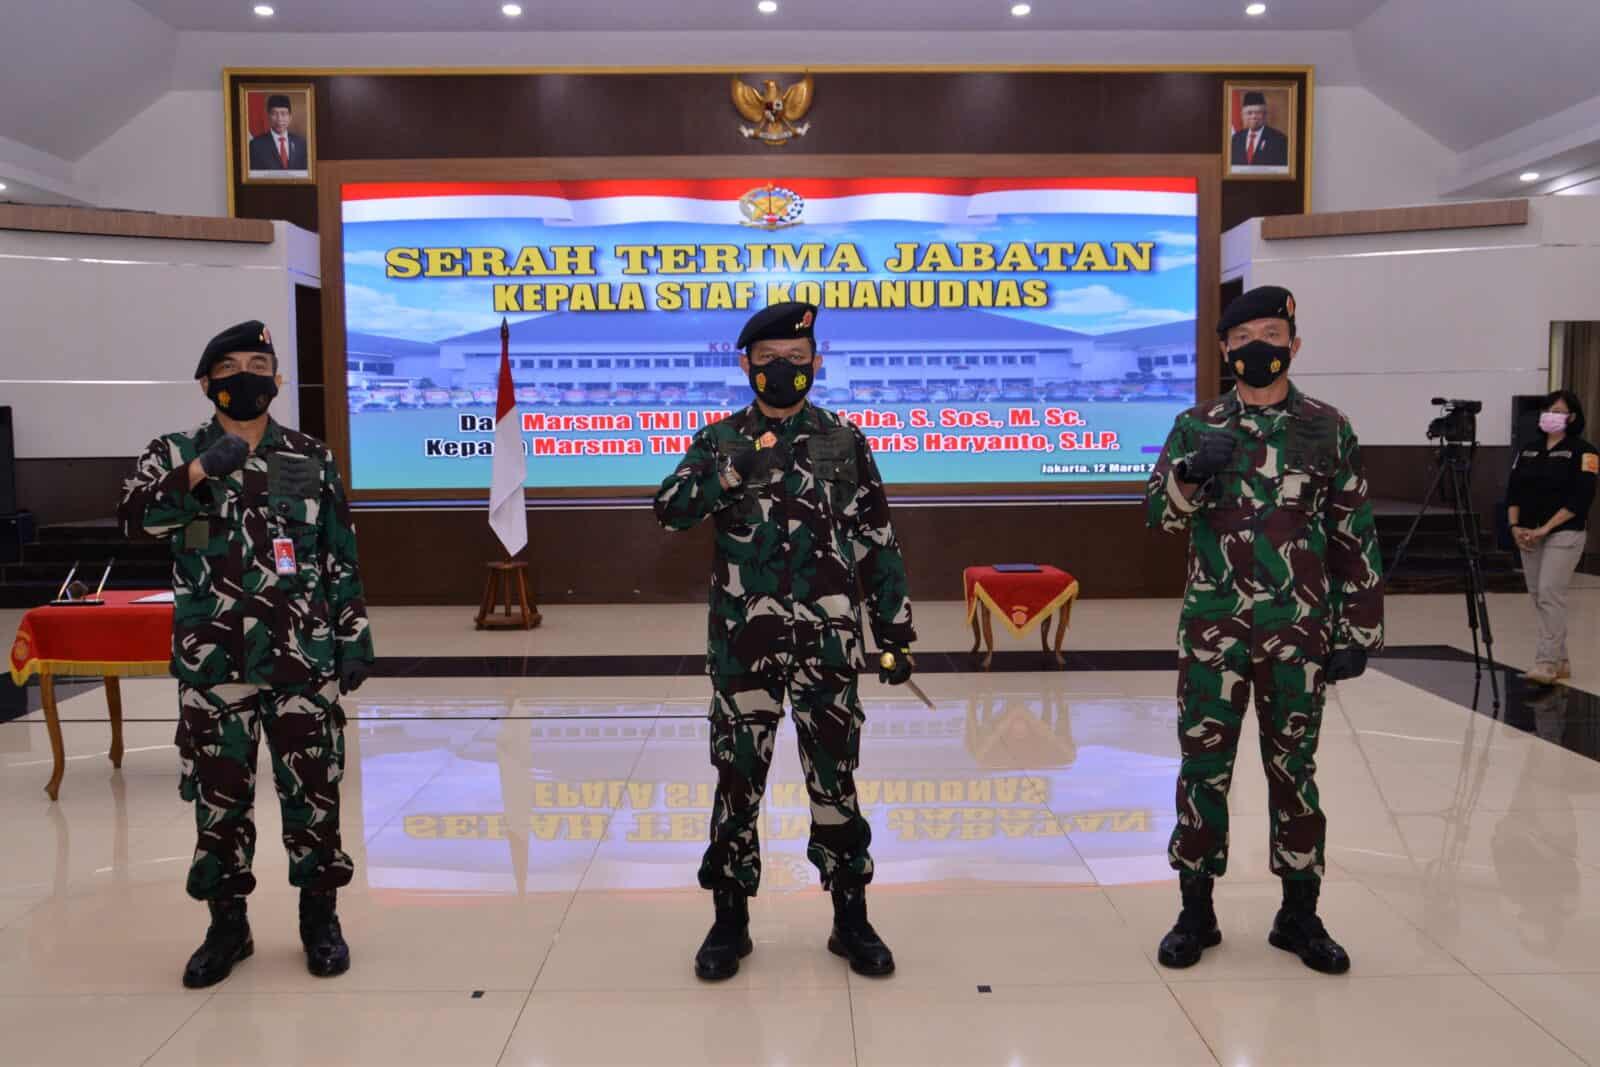 Pangkohanudnas Pimpin Serah Terima Jabatan Kepala Staf Kohanudnas